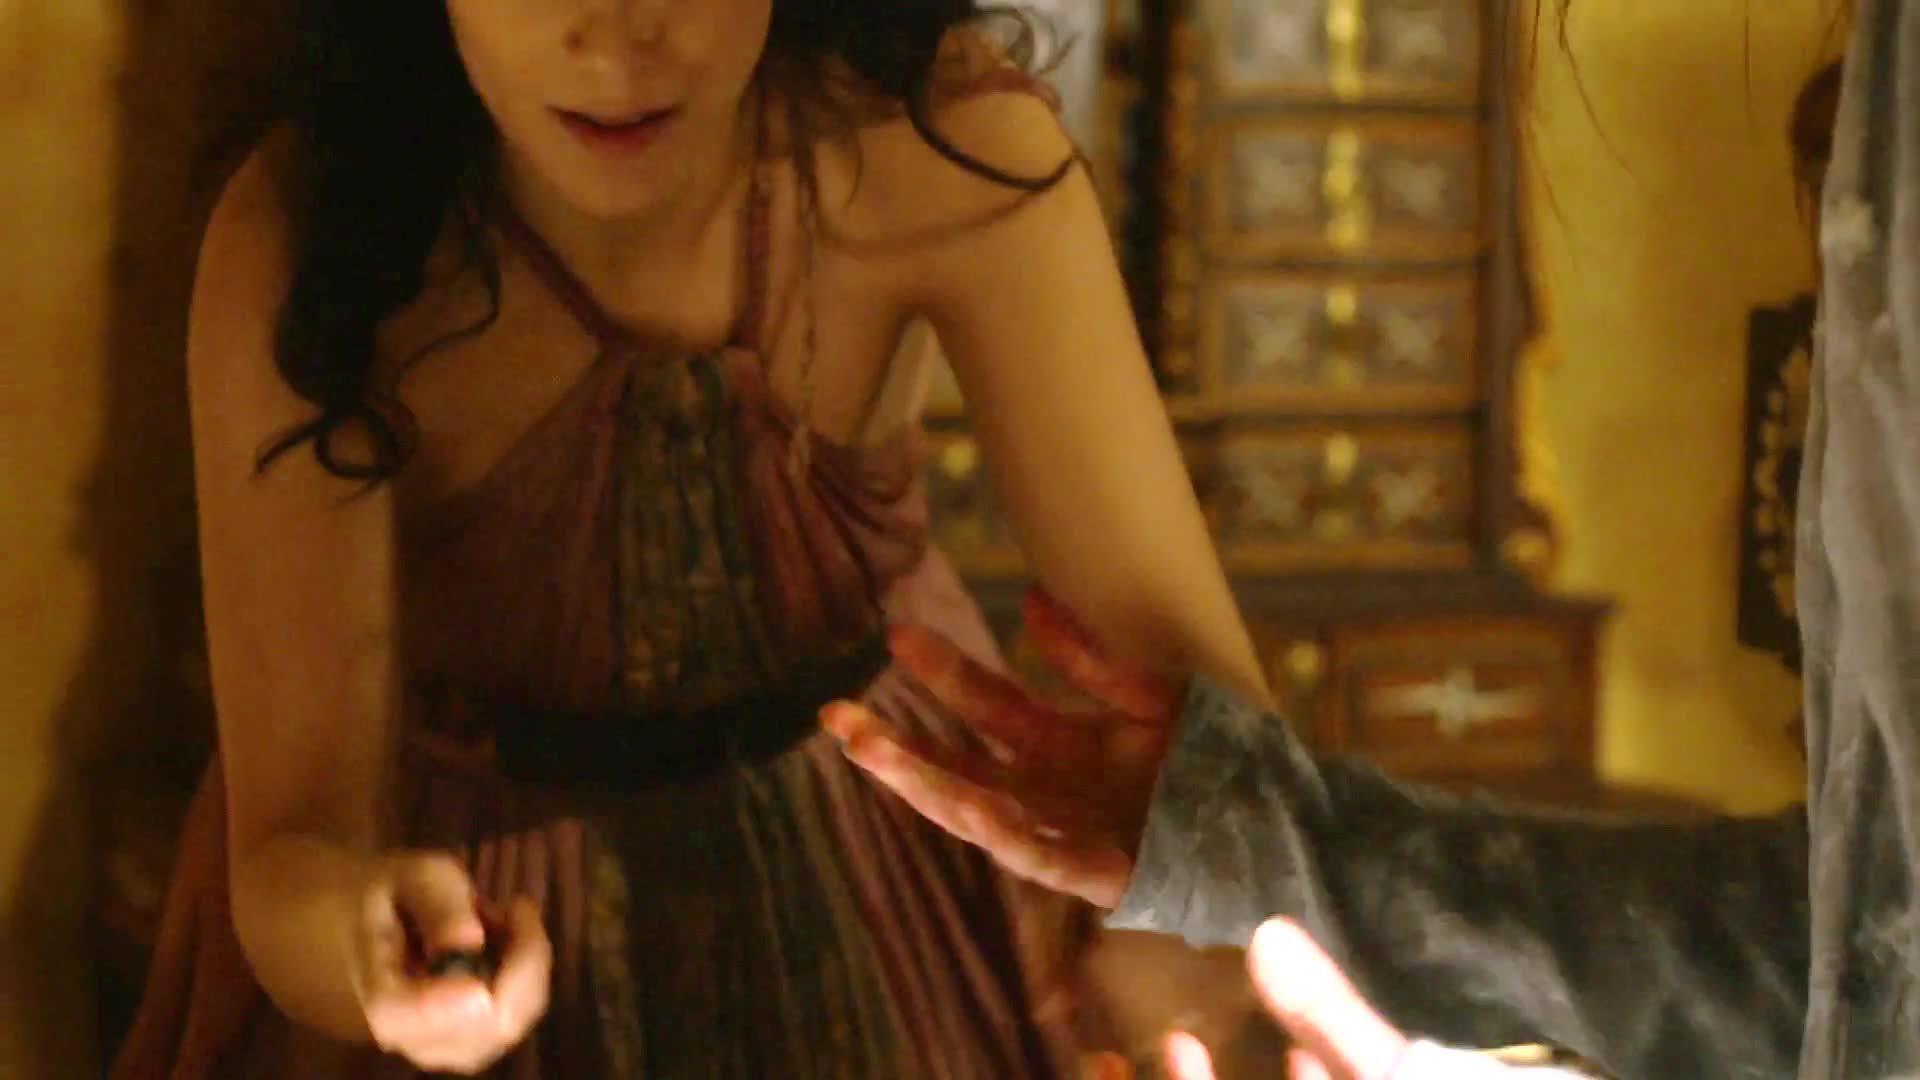 sophieturner, Sophie Turner's almost plot in last season's GoT... (reddit) GIFs